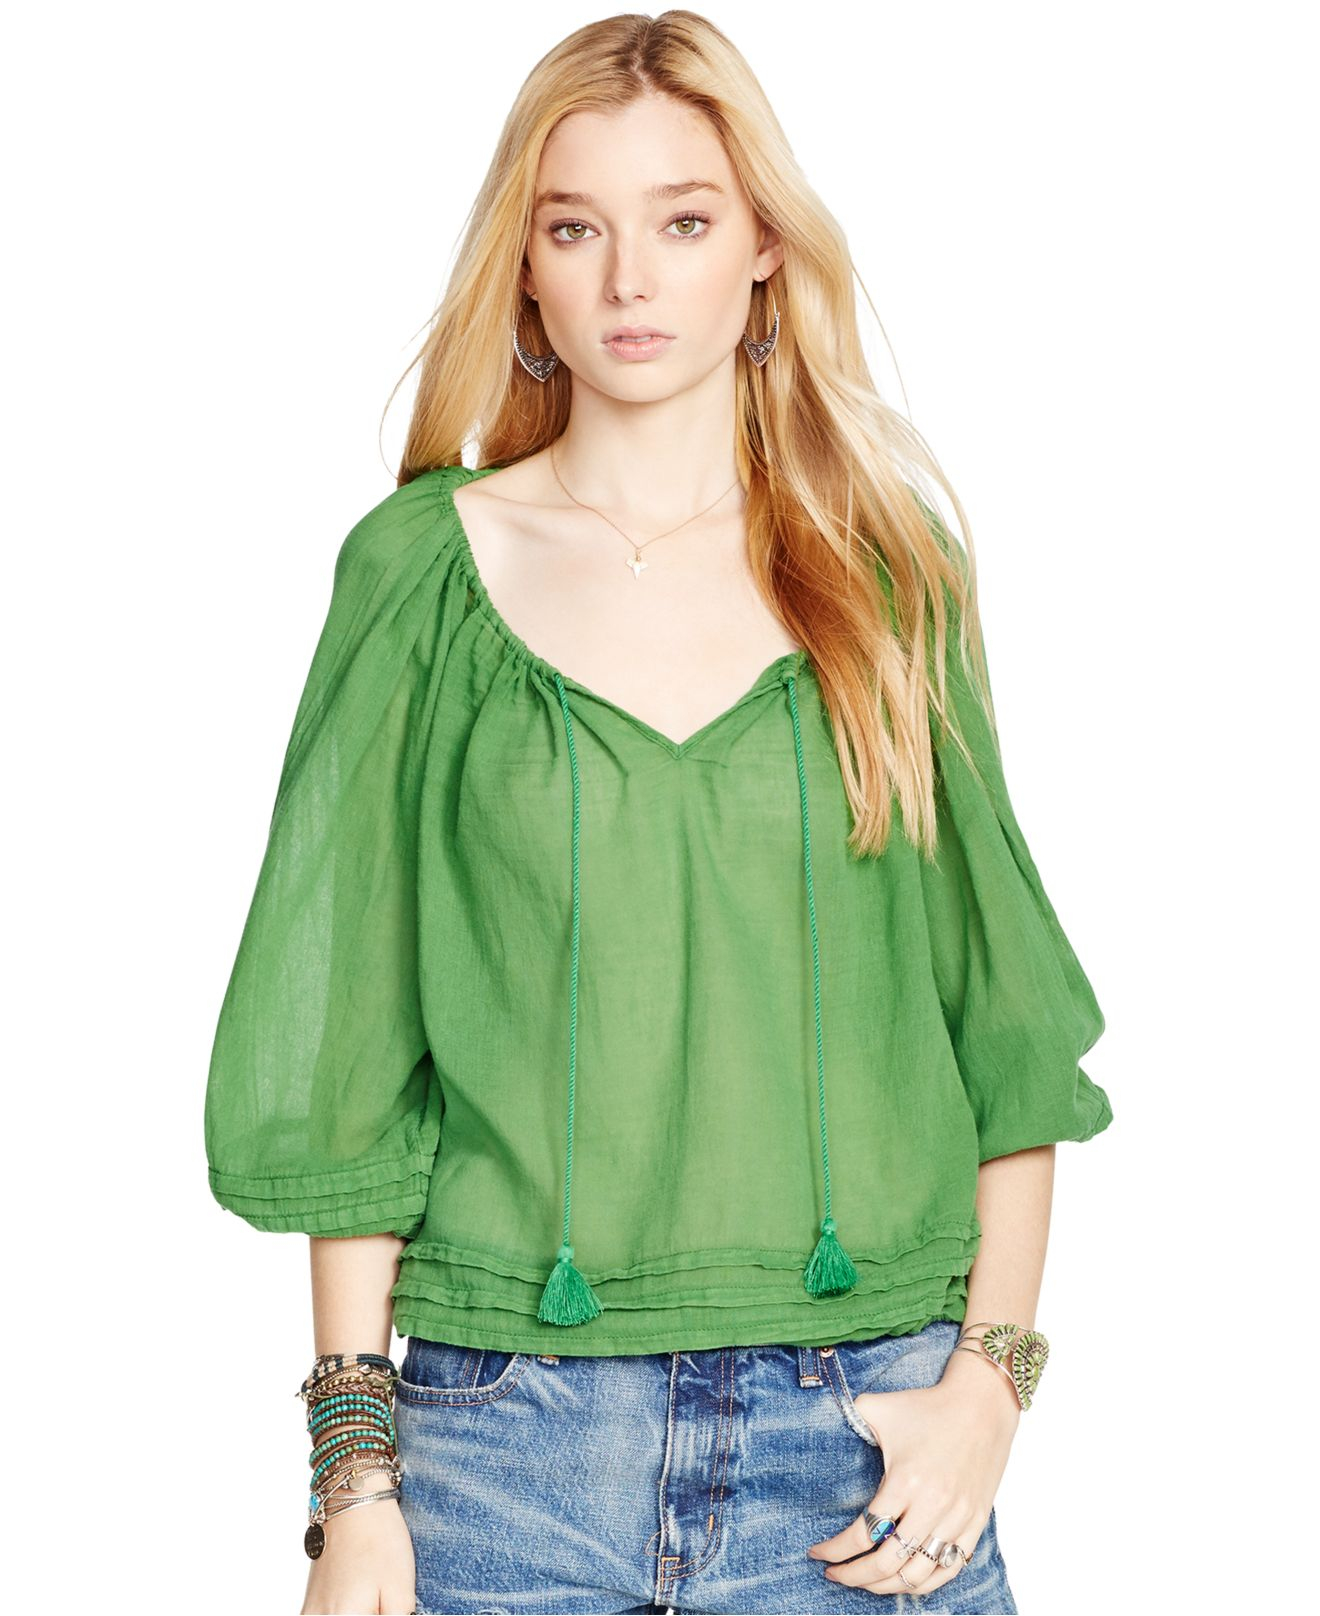 76c2025508ece9 Macys Ralph Lauren Womens Shirts – EDGE Engineering and Consulting ...